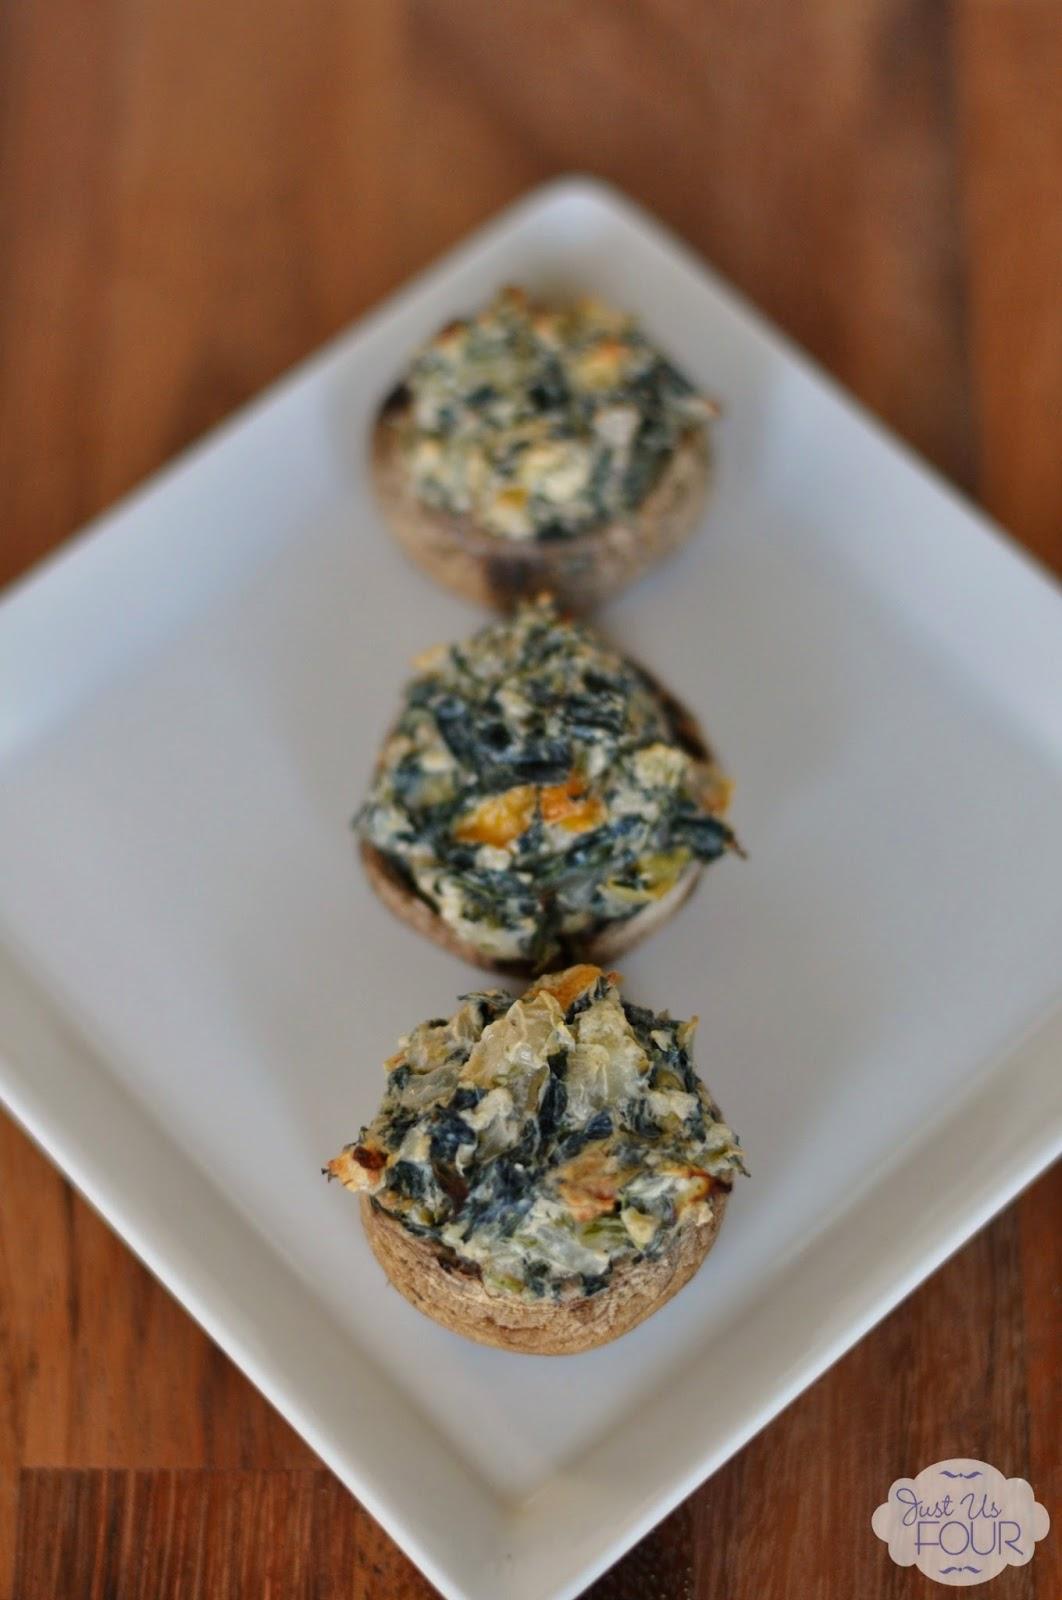 Spinach+Stuffed+Mushrooms+on+Plate_wm.jpg